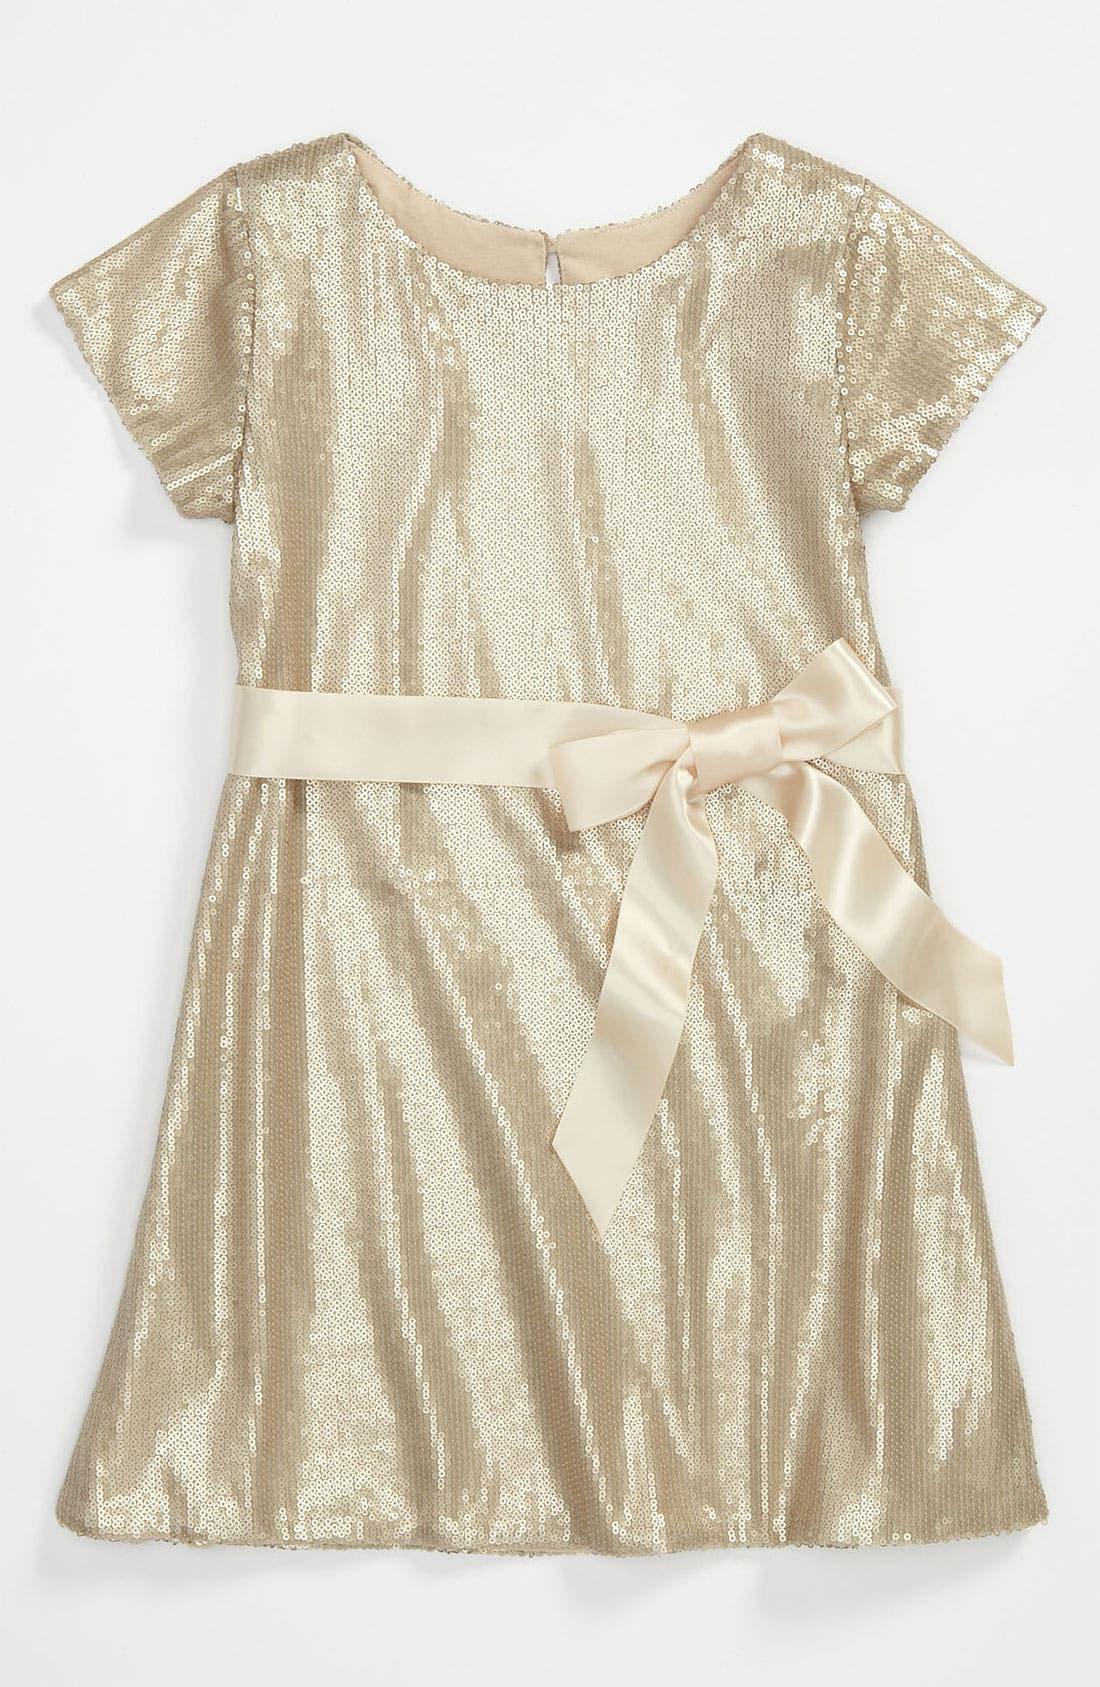 Main Image - Halabaloo 'Gorgeous' Sequin Dress (Little Girls & Big Girls)